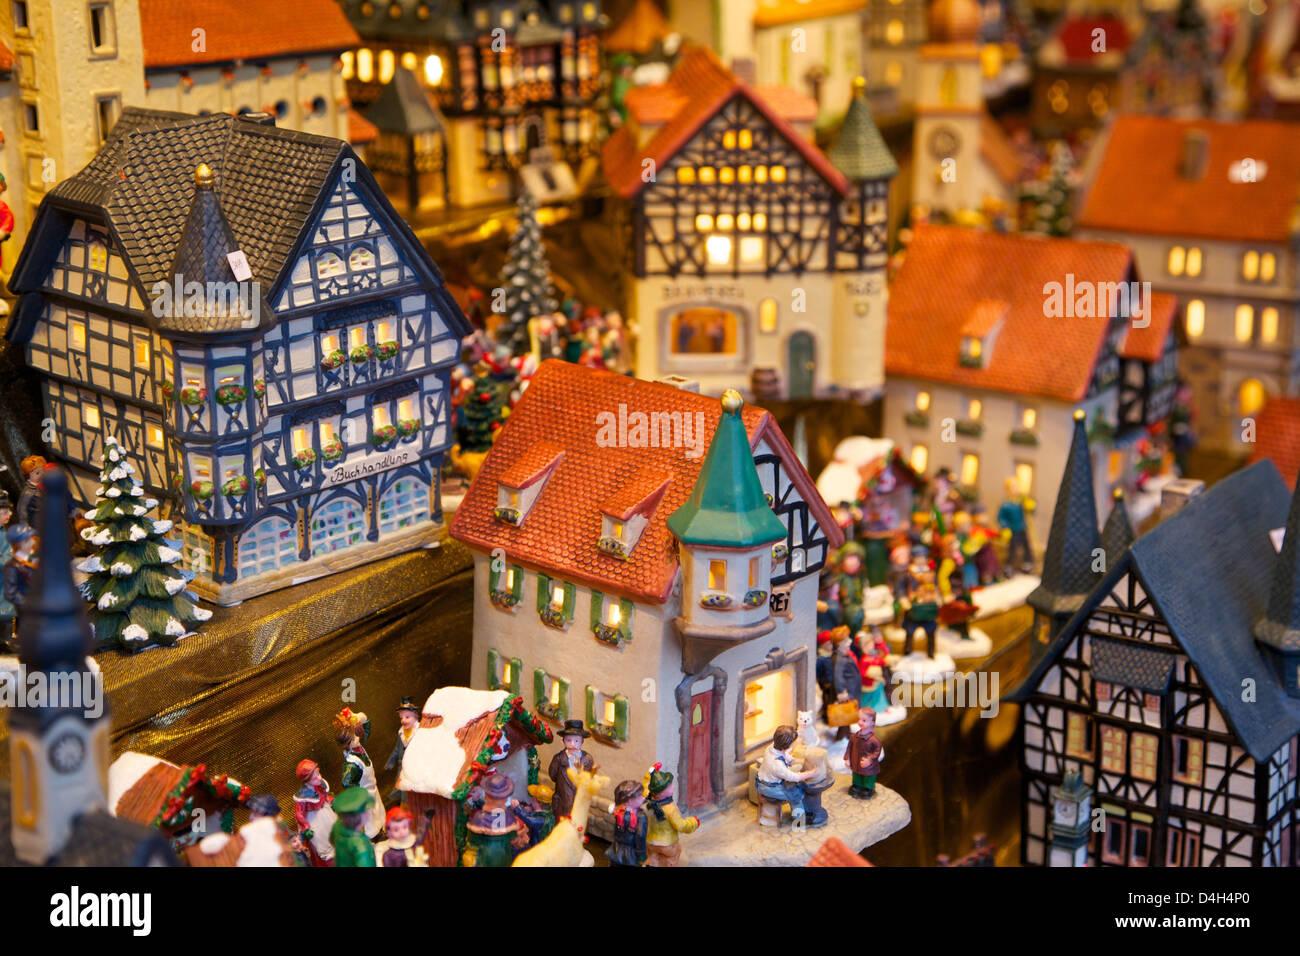 Christmas ornaments for sale at the Christmas Market, Dortmund, North Rhine-Westphalia, Germany - Stock Image